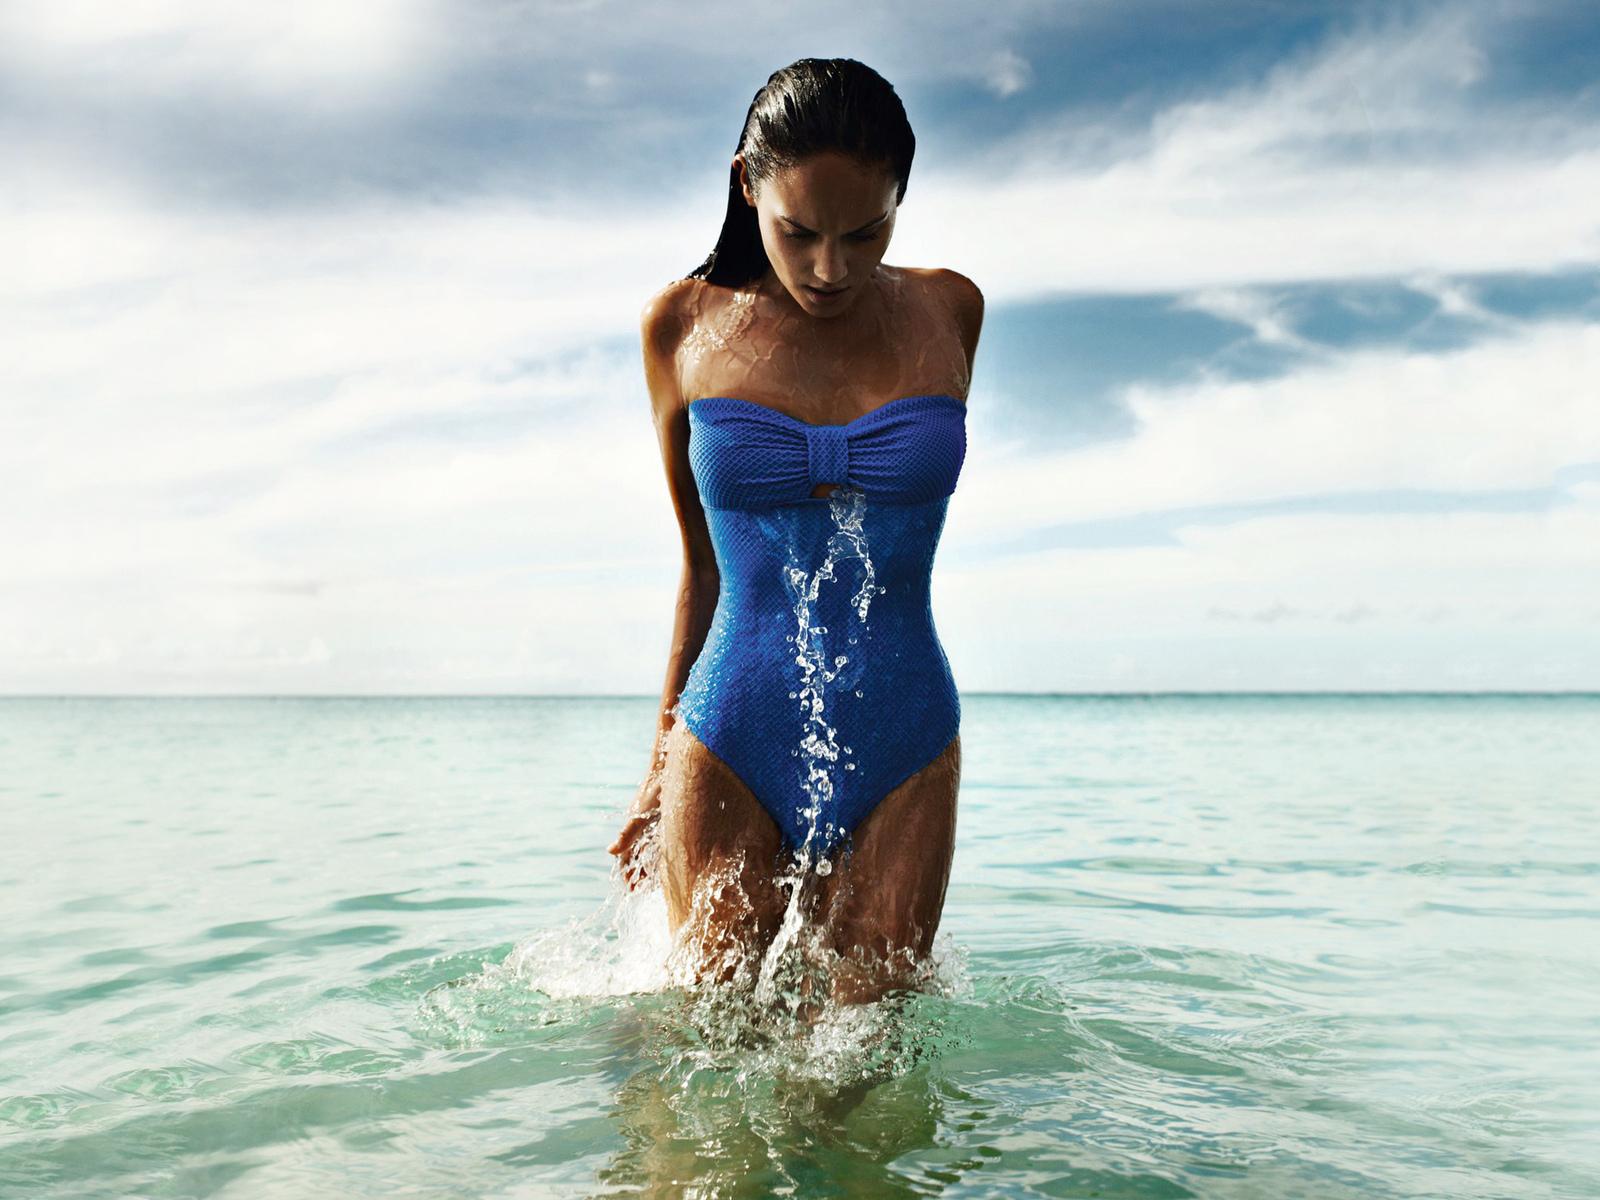 девушка, мокрая, море, брызги